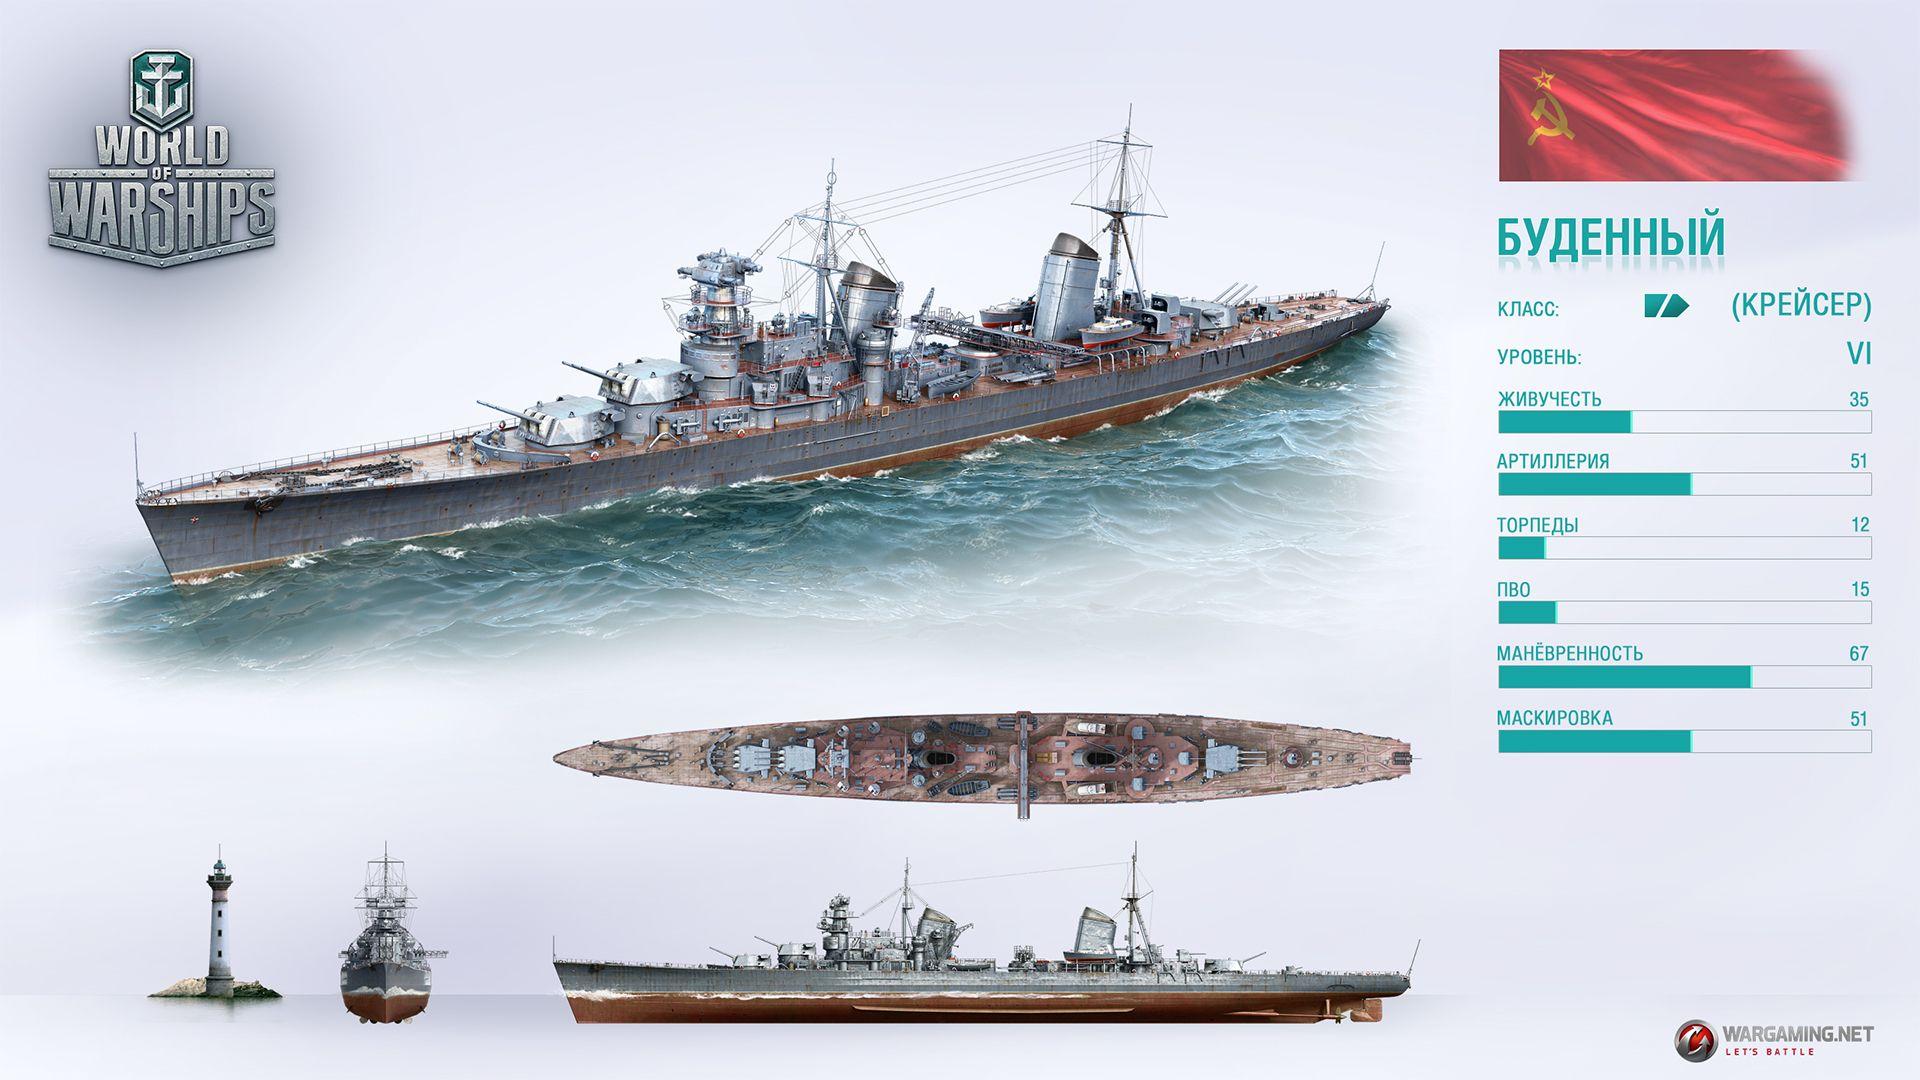 medium resolution of budyonny class cruisers russia naval history pinterest nelson class battleship battleship in ww2 russian diagram